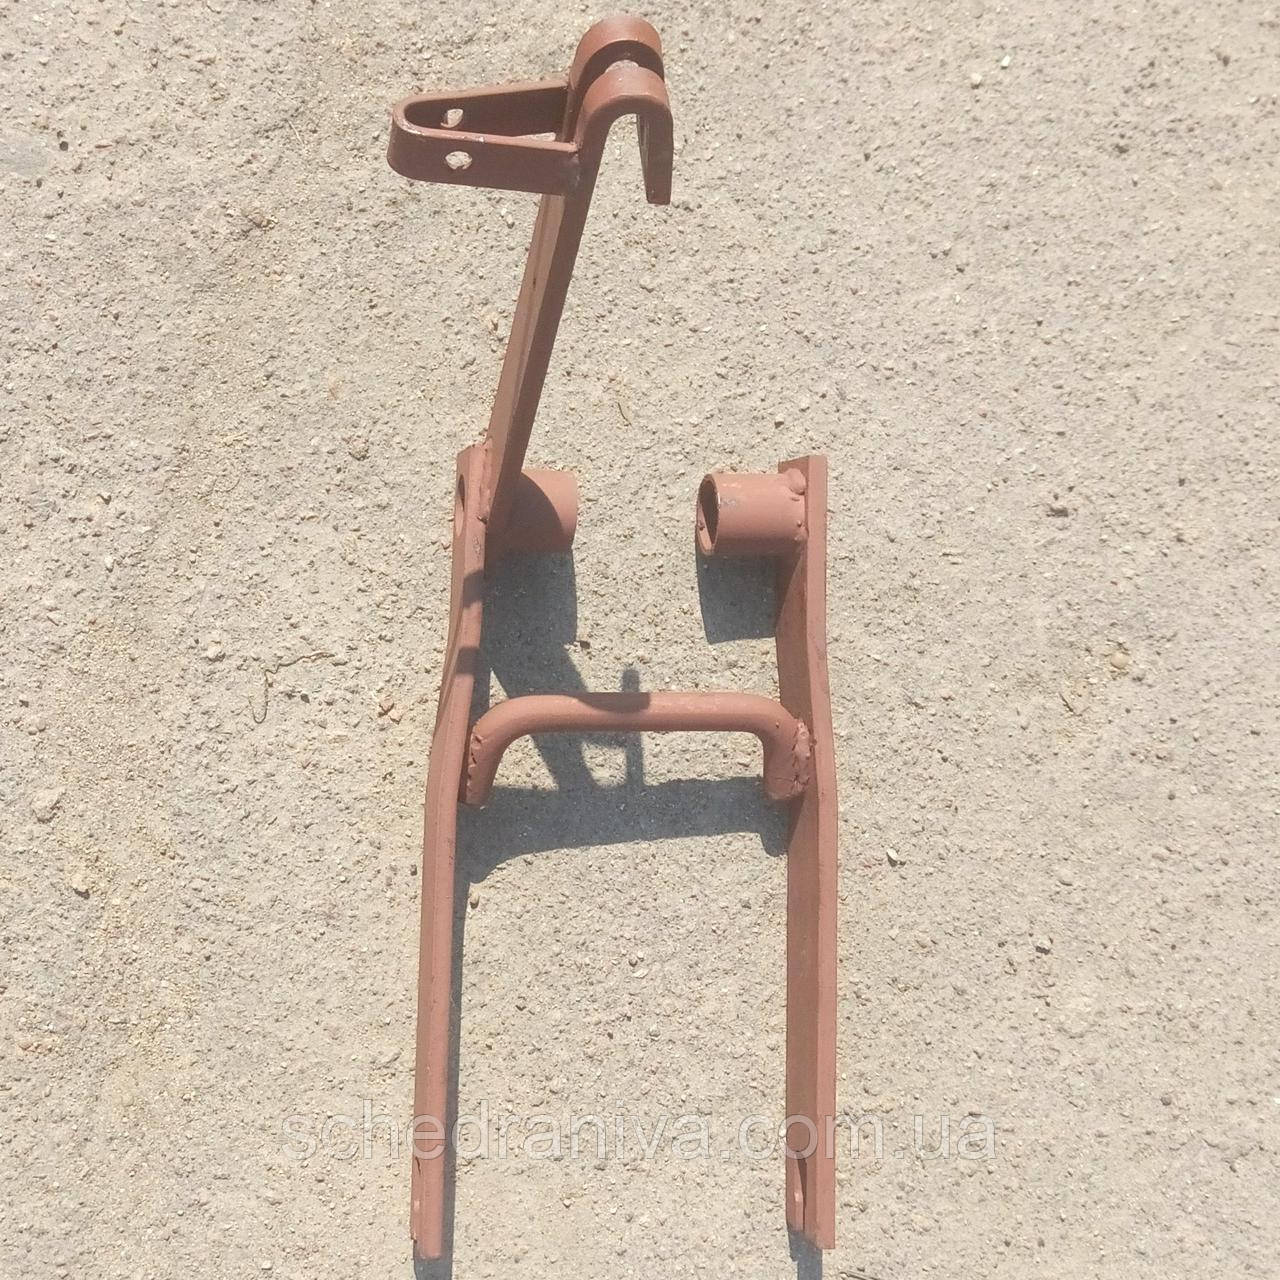 Рамка КРН 46.120 тримає прикатывающее колесо